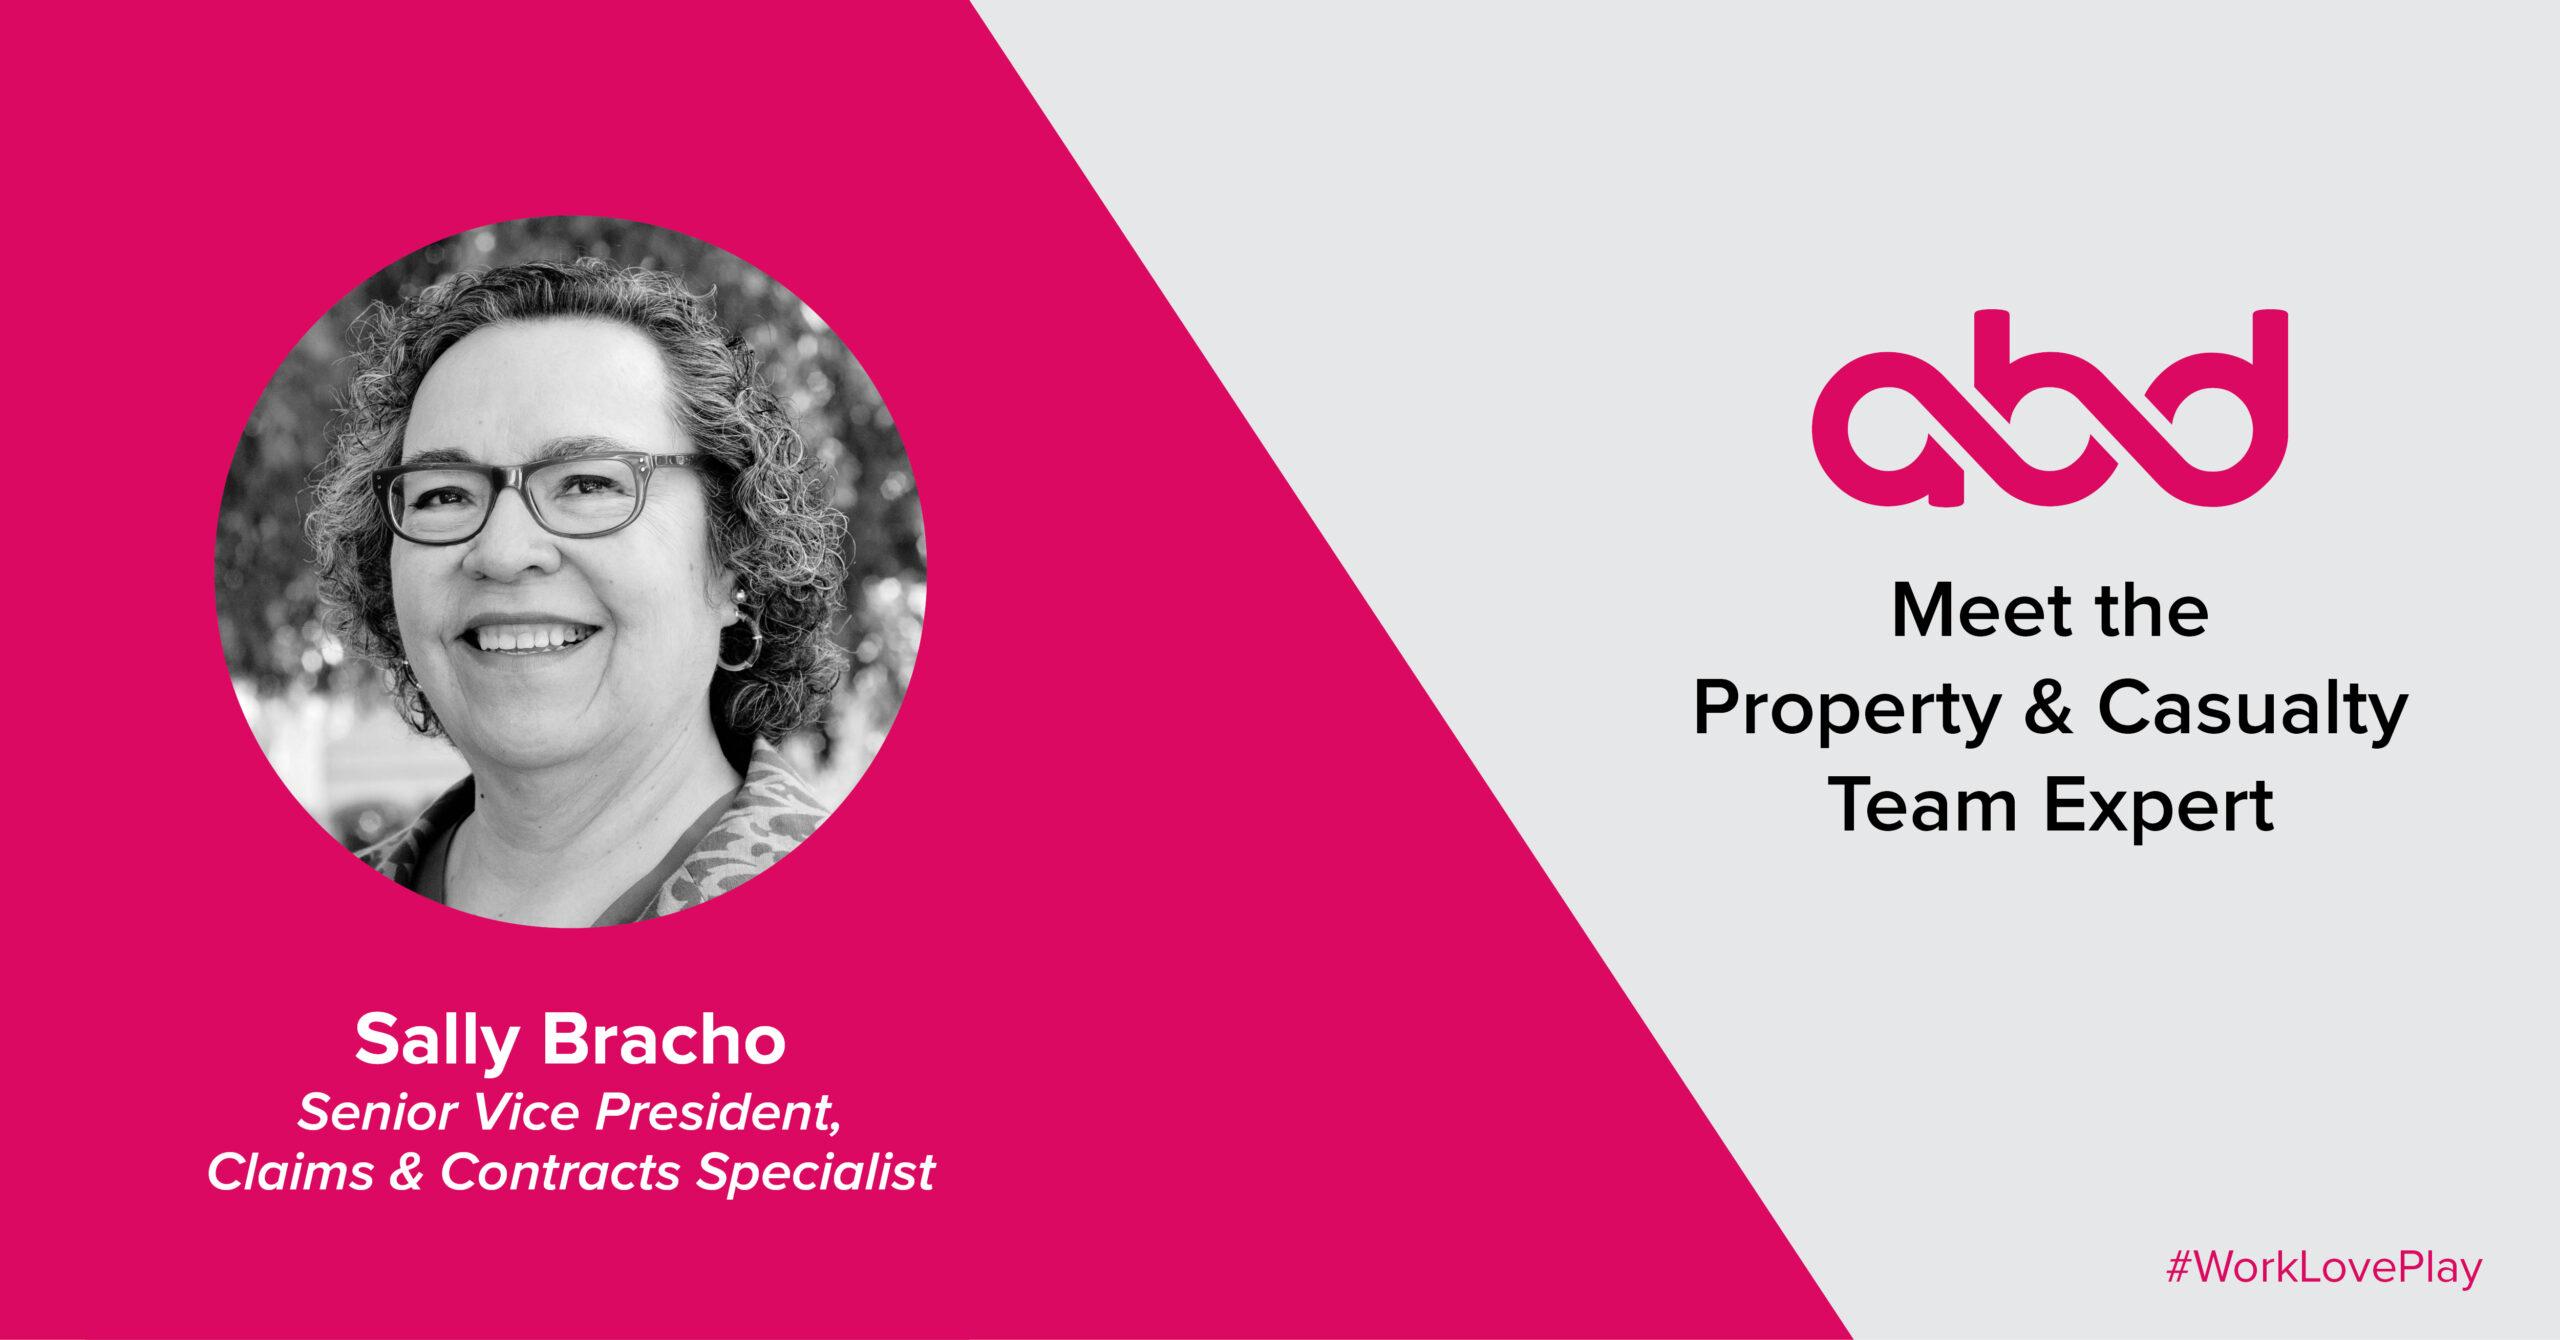 contract specialist Sally Bracho